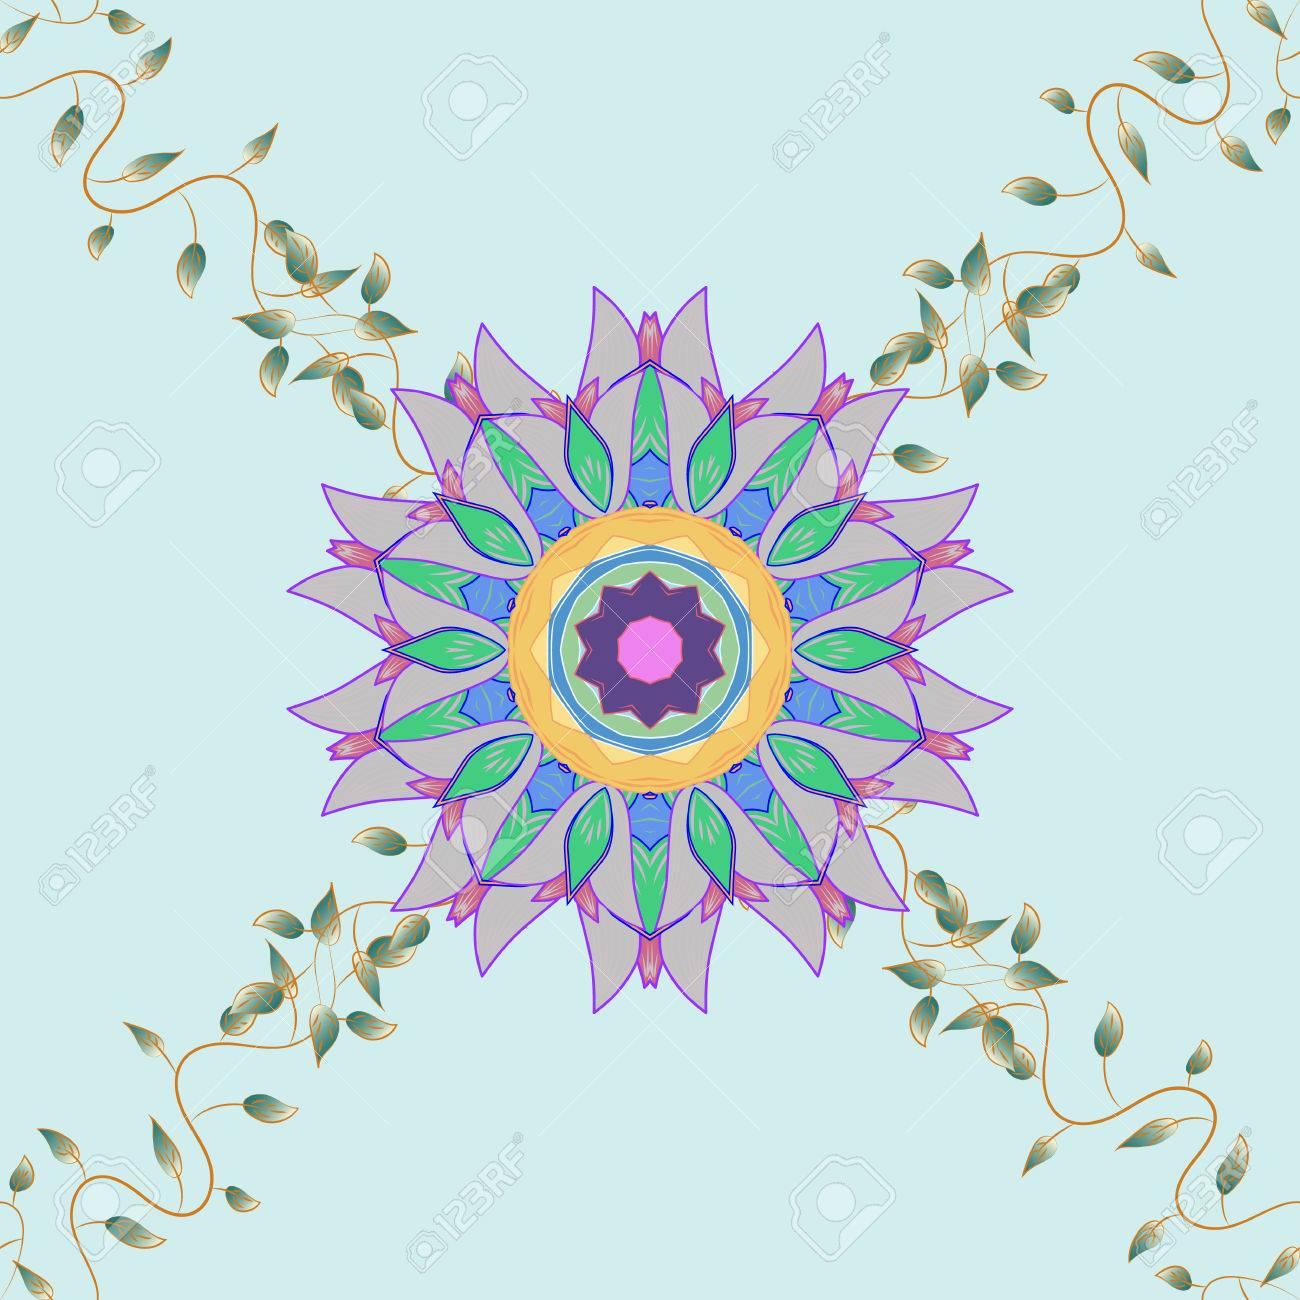 Mandala on blue background  Spiritual and ritual symbol of Islam,